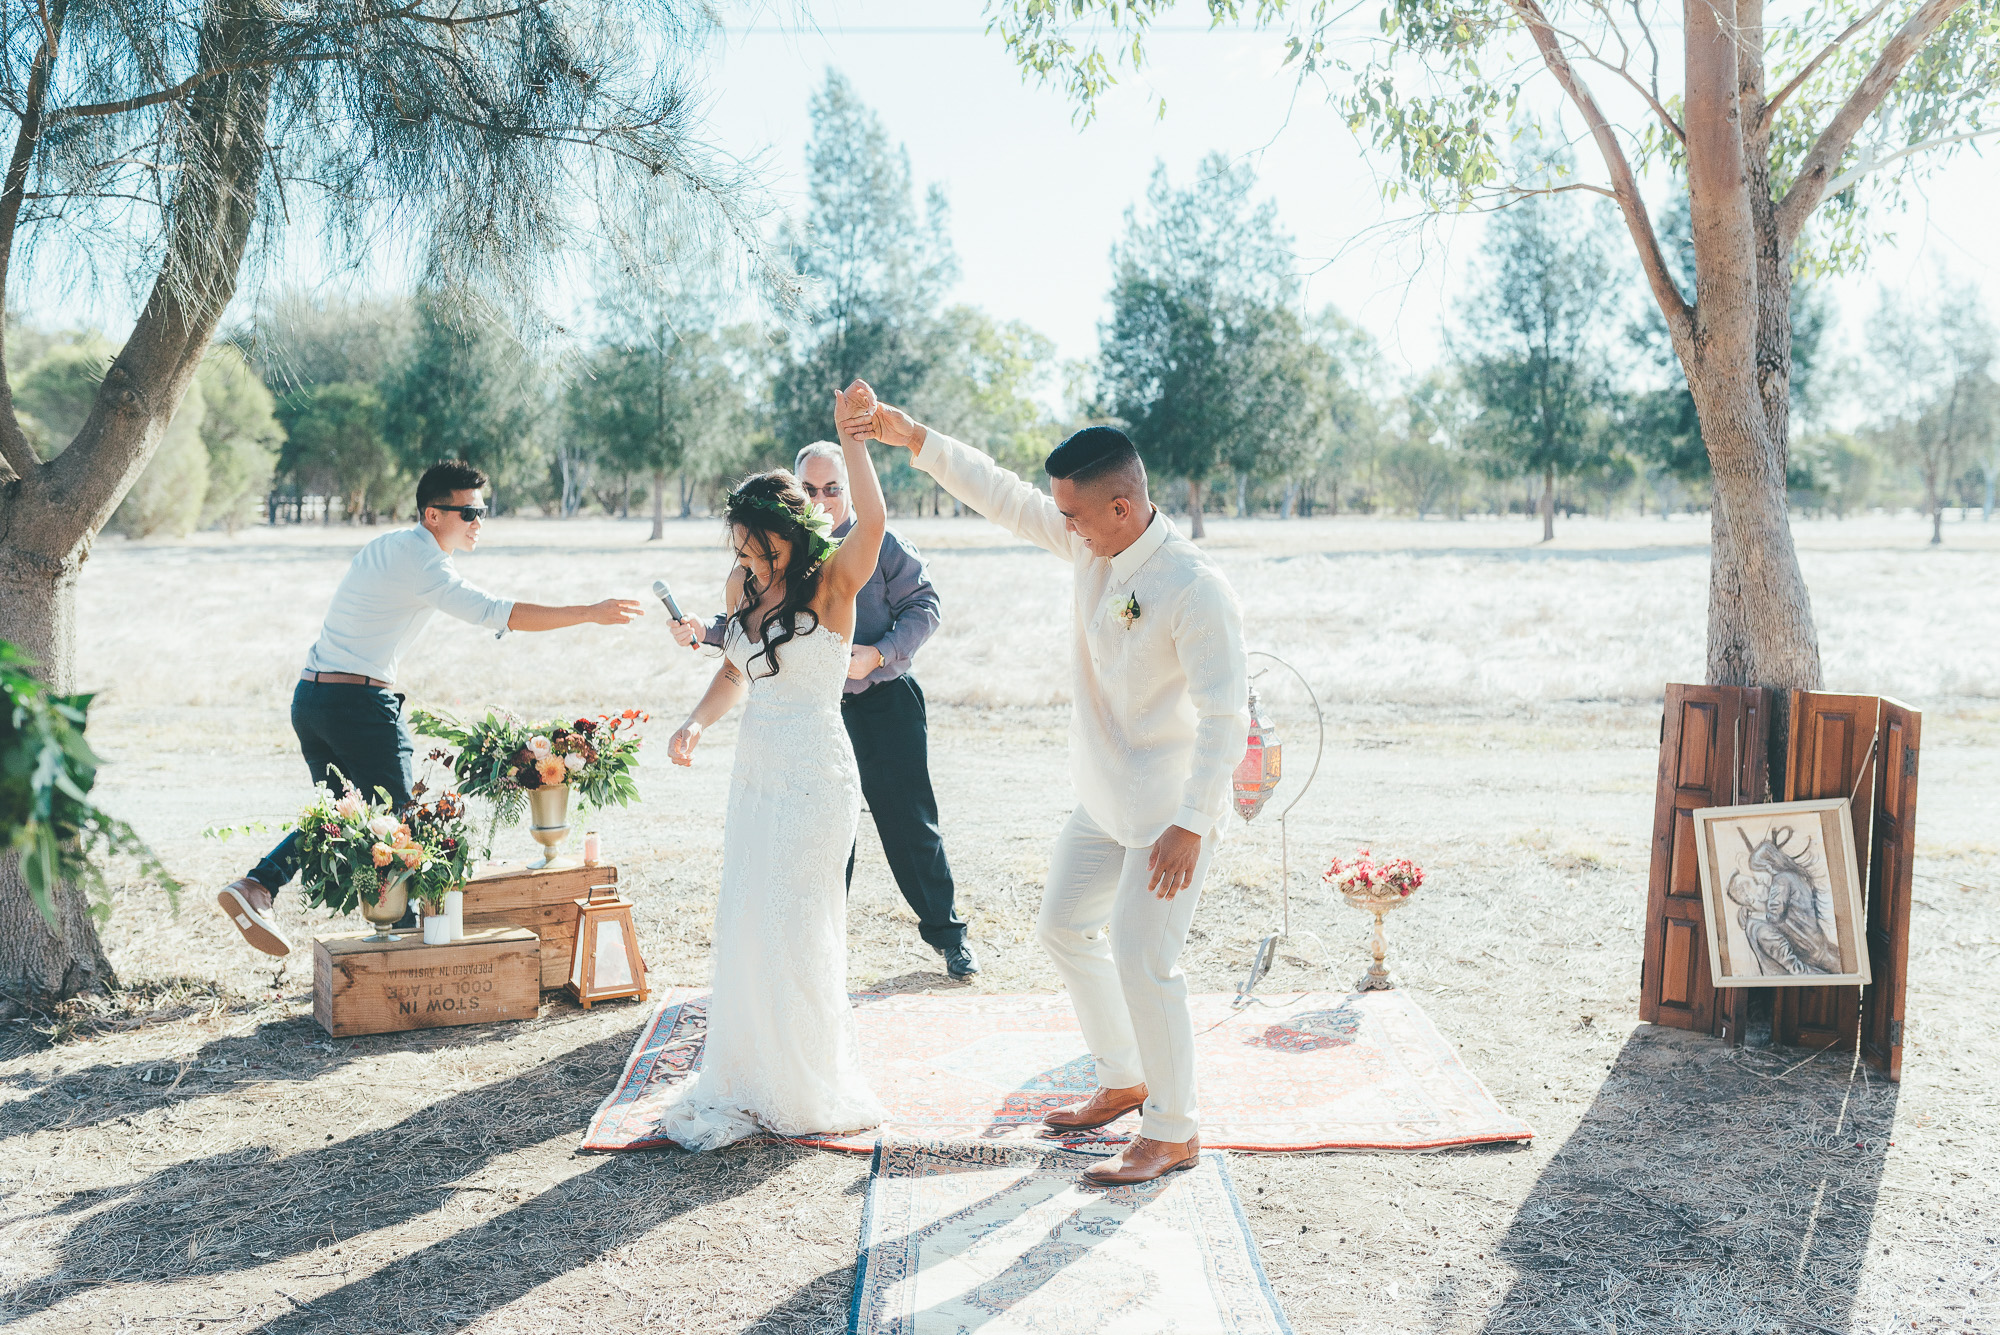 wedding-photographer-outdoor-casual-styled-los-angeles-australia-california-international-earthbound -36.jpg